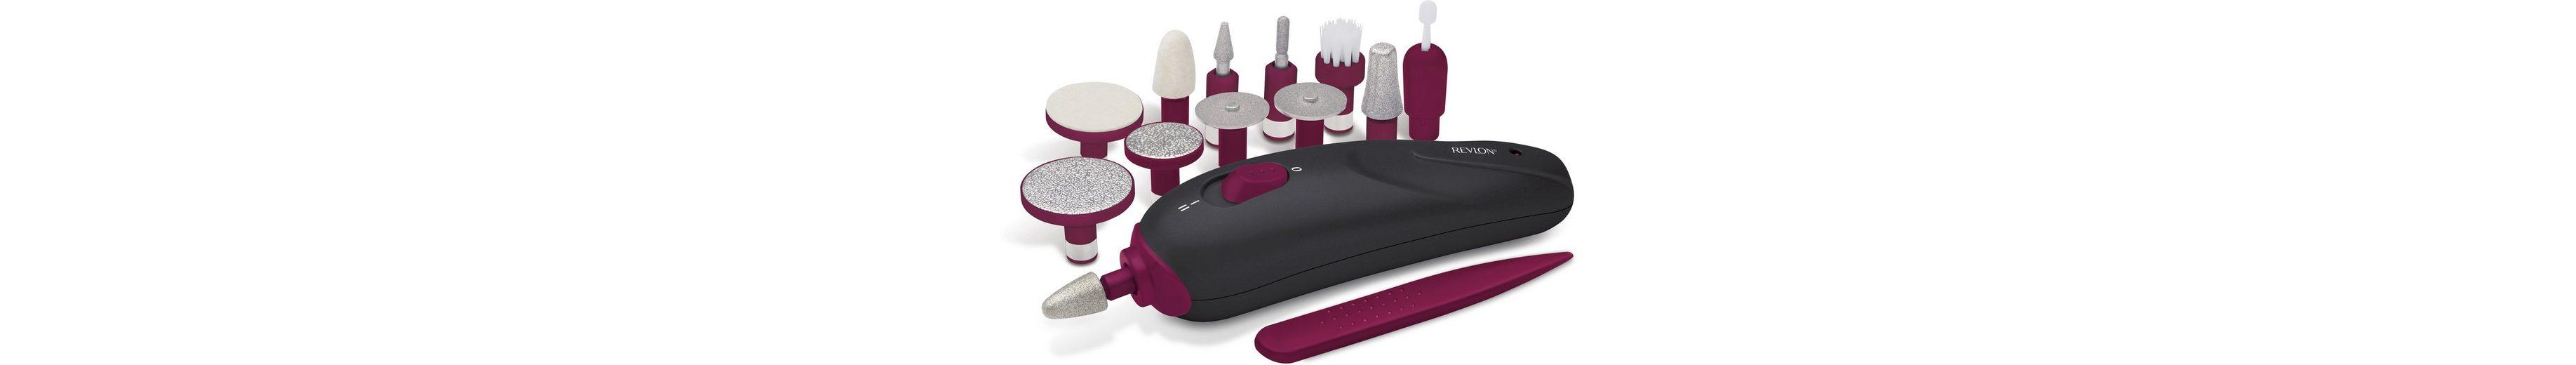 Revlon® Pediküre/Maniküre-Gerät STYLE & DRY RVSP3529PKE, integrierter Nageltrockner